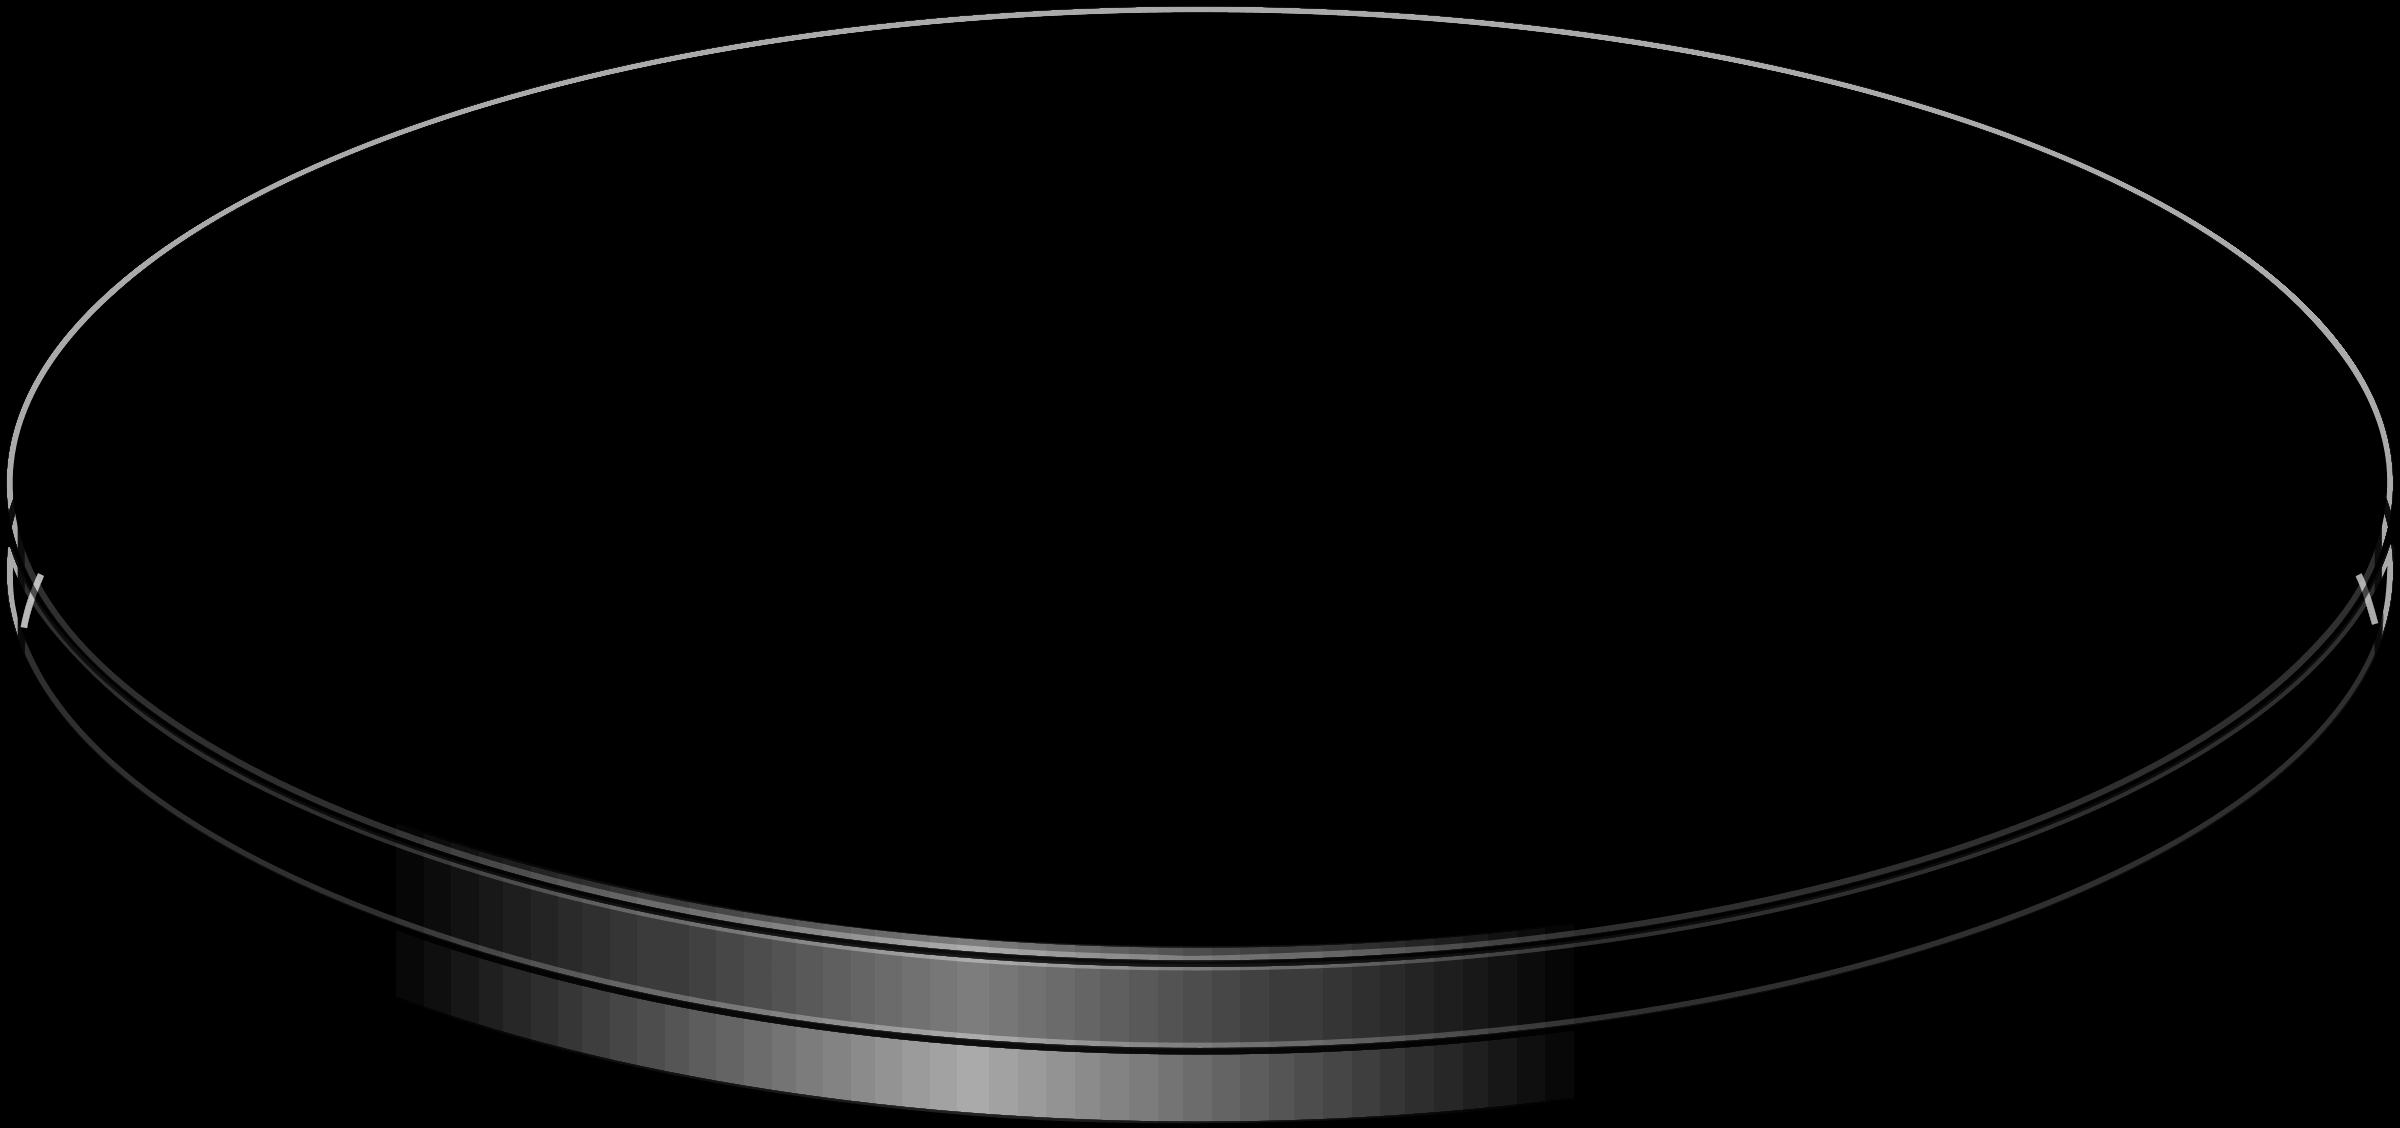 jpg download Dish clipart. Petri big image png.